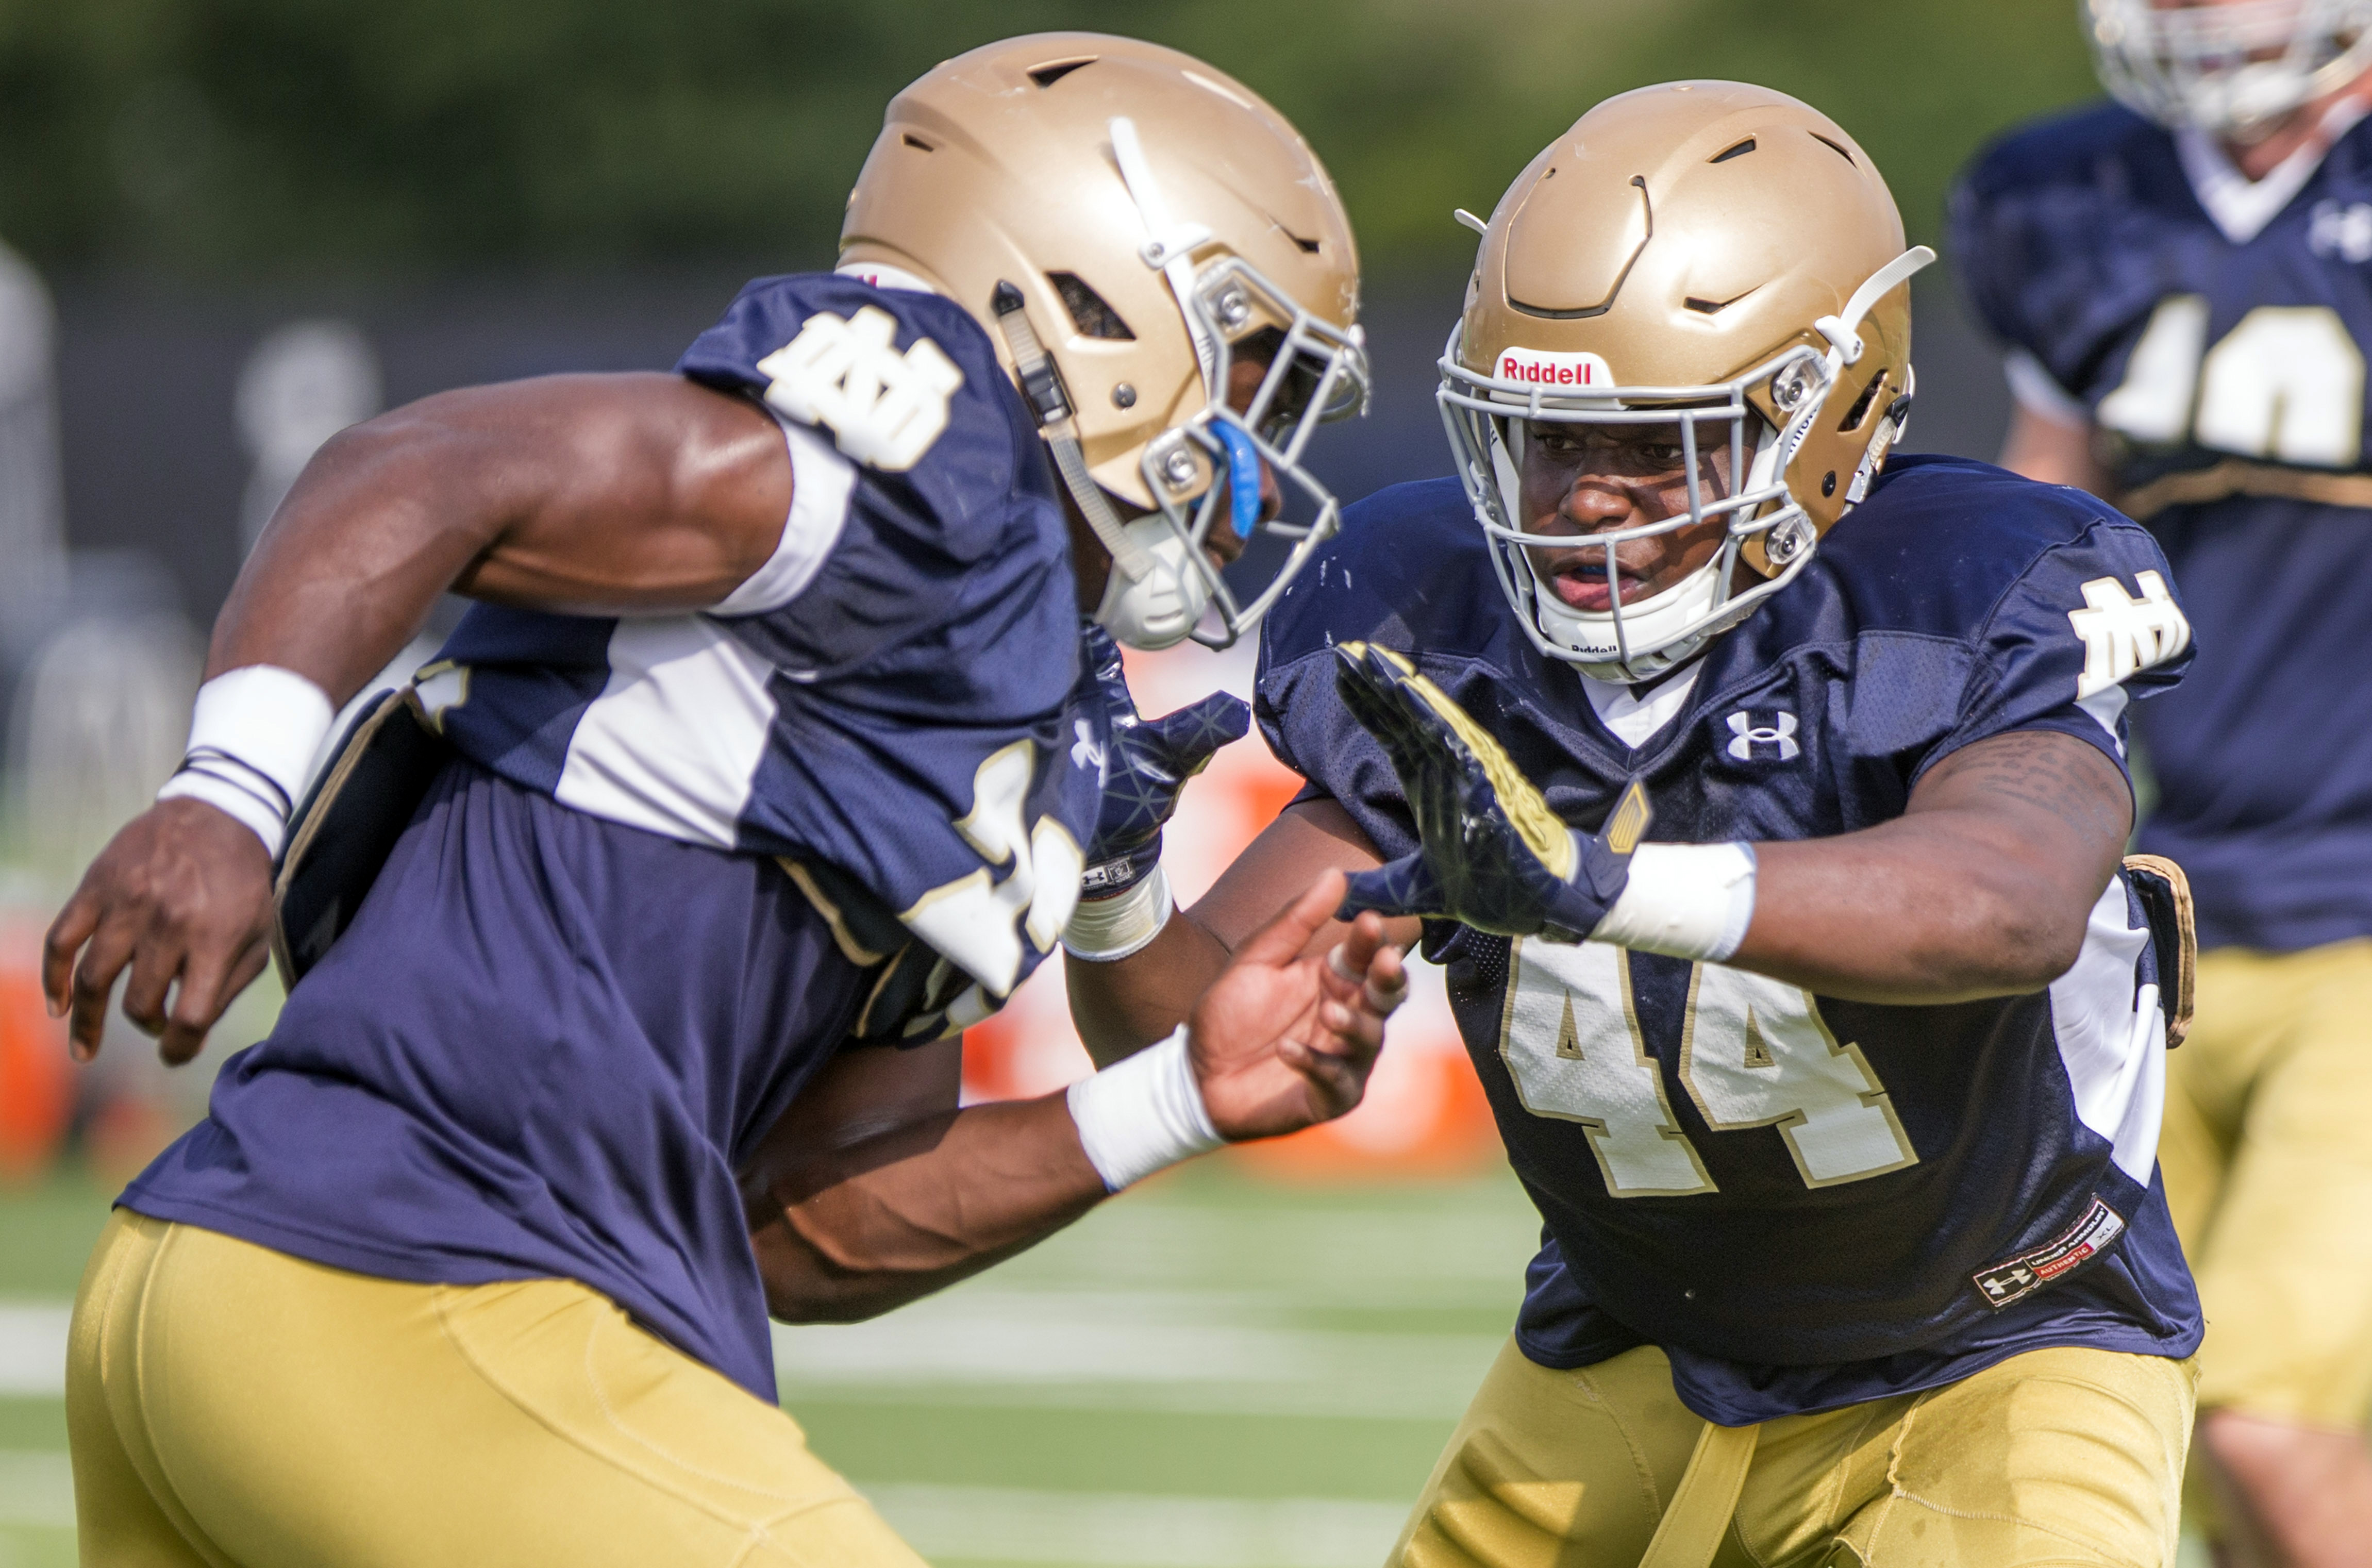 Notre Dame linebackers Asmar Bilal (22) and Jamir Jones (44) run drills during NCAA college football practice Thursday, Aug. 11, 2016, in South Bend, Ind. (Robert Franklin/South Bend Tribune via AP)